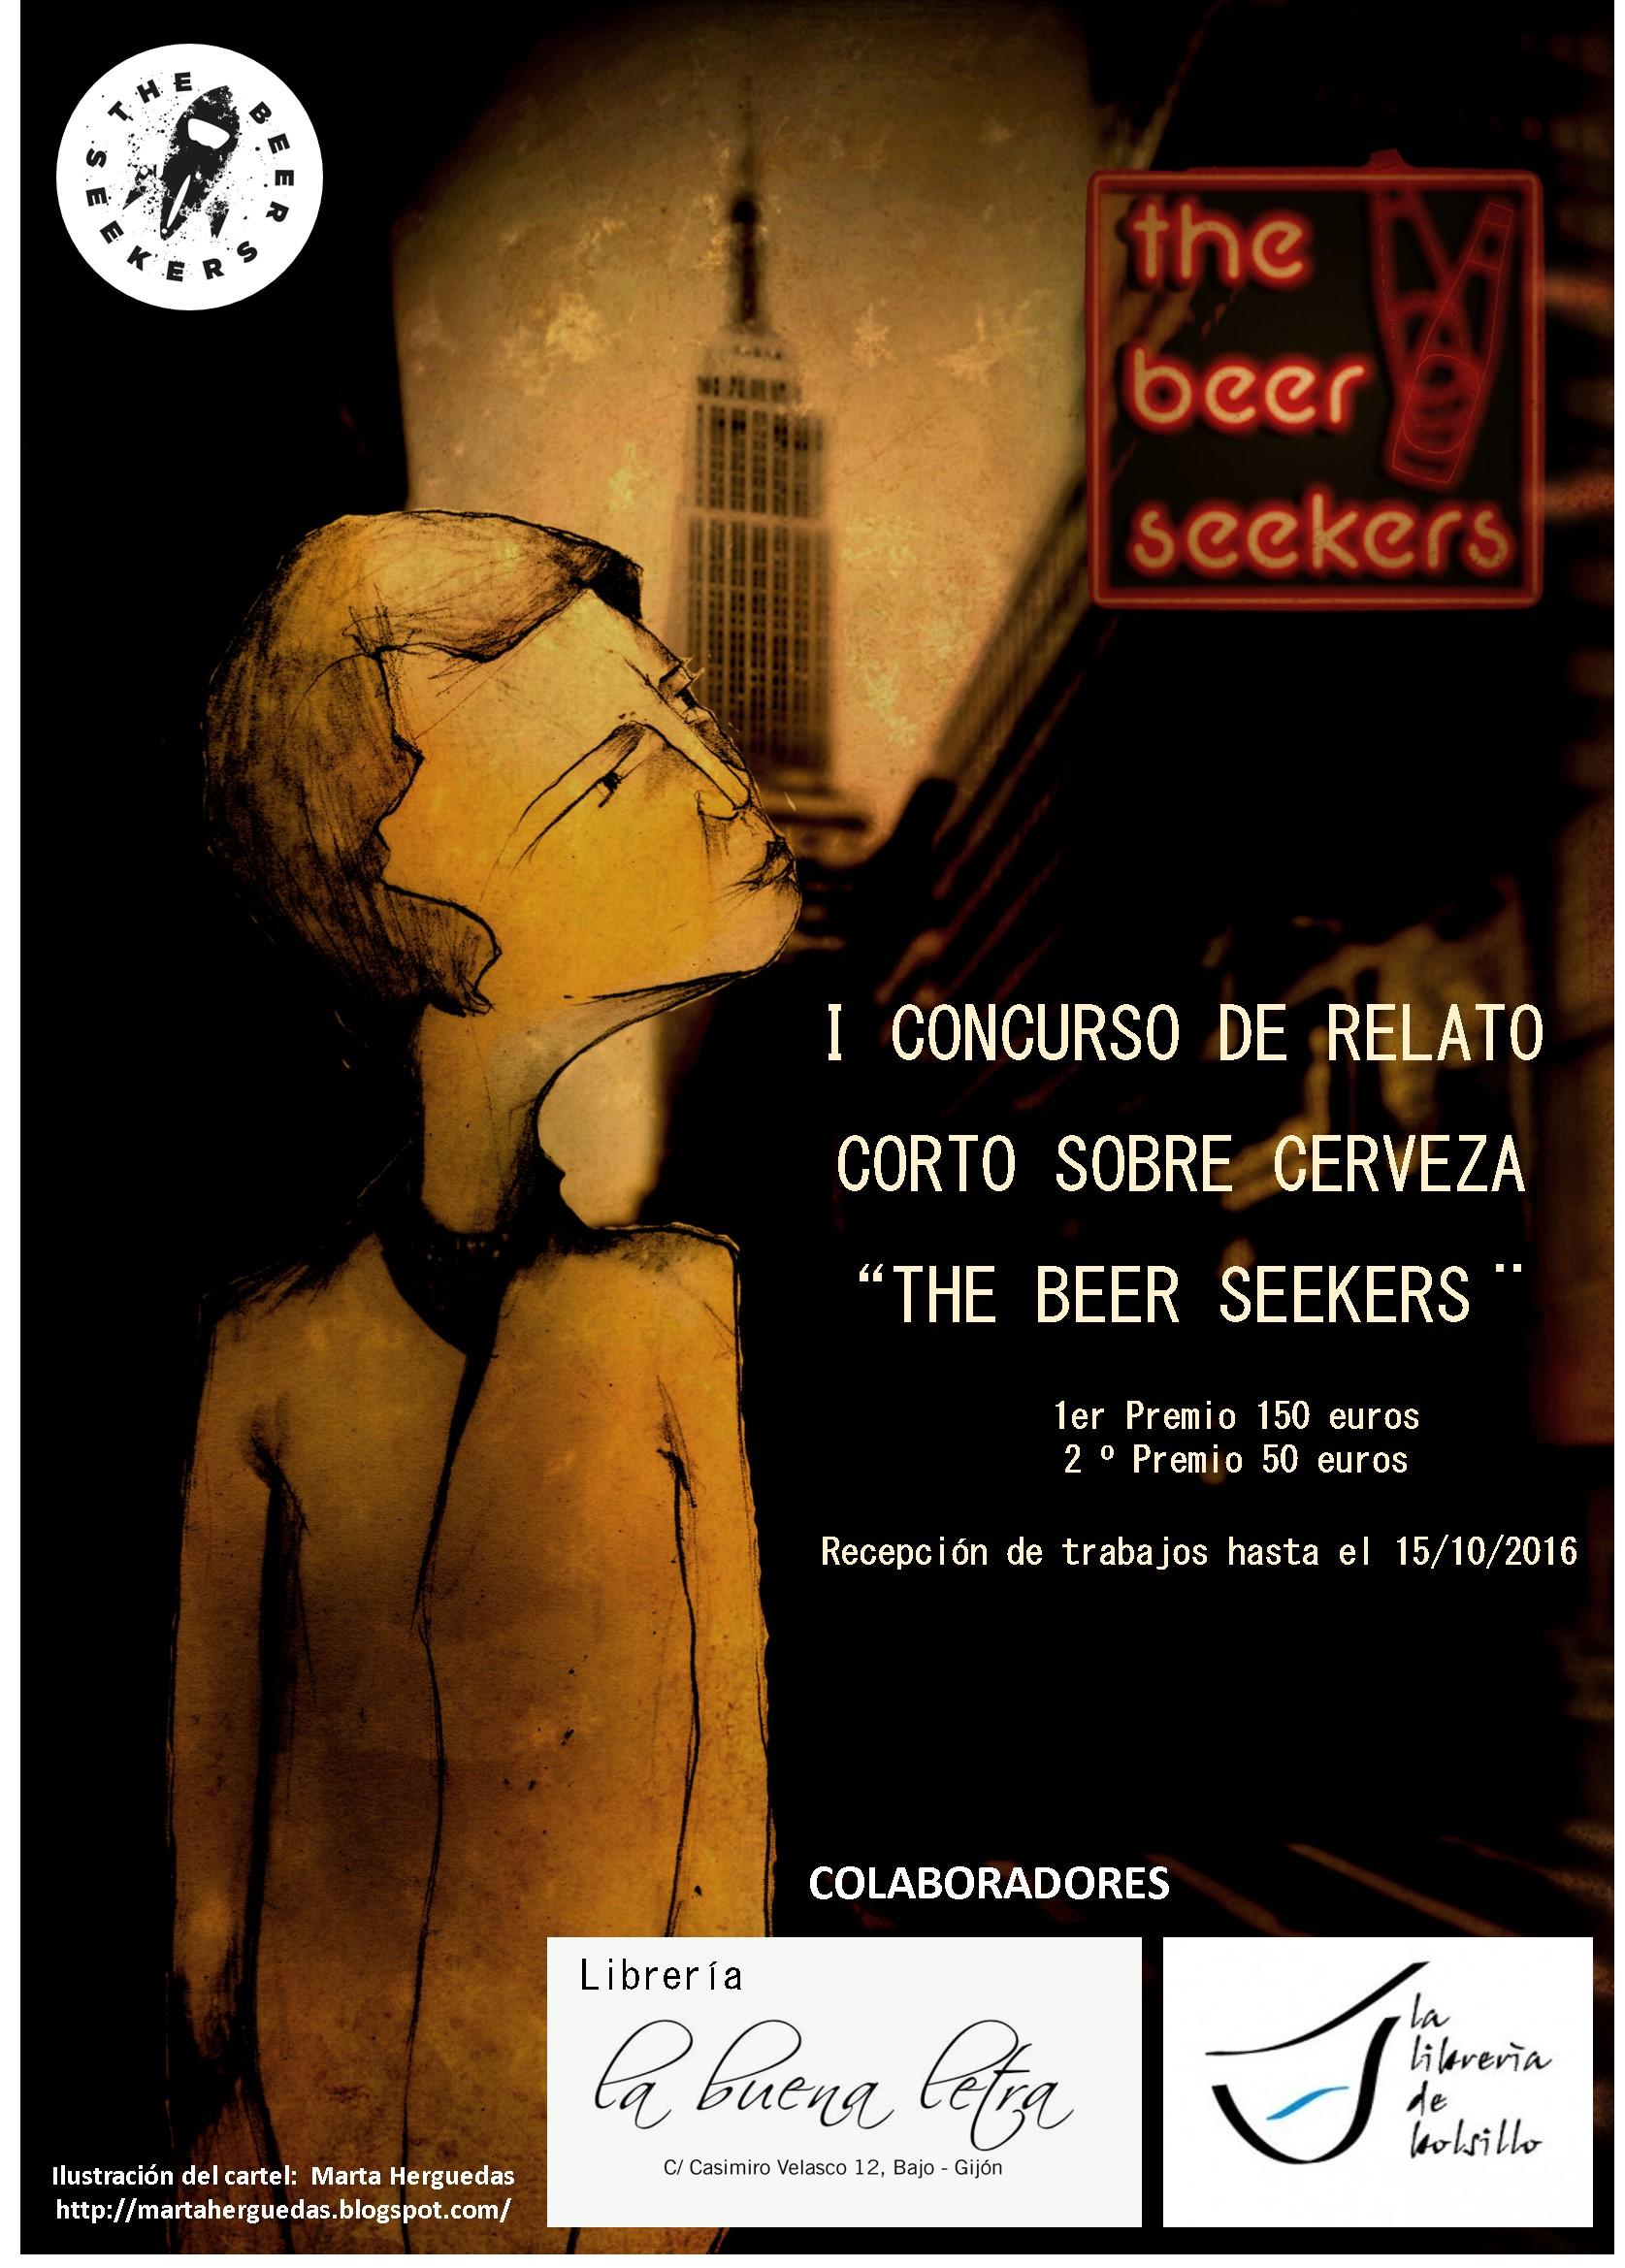 I CONCURSO DE RELATOS THE BEER SEEKERS